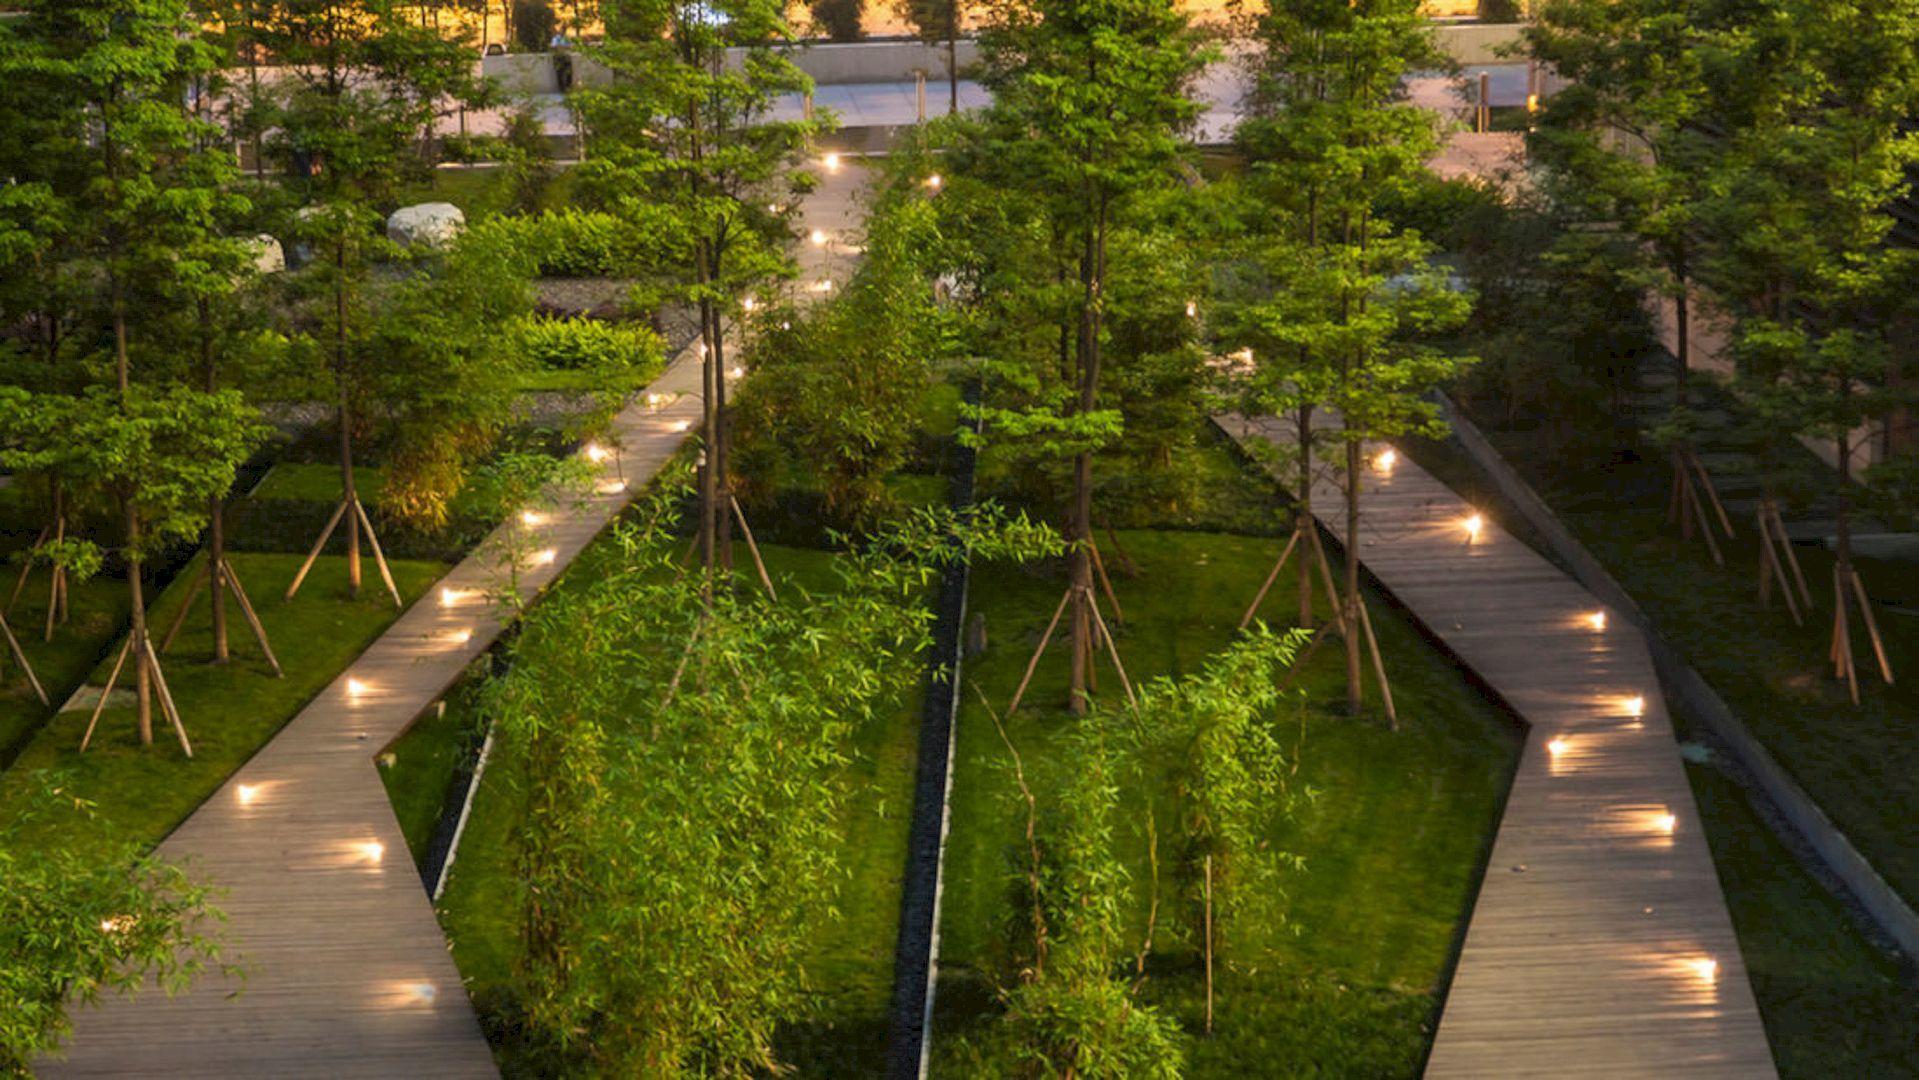 Symantec Chengdu A Modern Oasis Landscape In Dense Urban Location Urban Landscape Design Urban Landscape Landscape Design